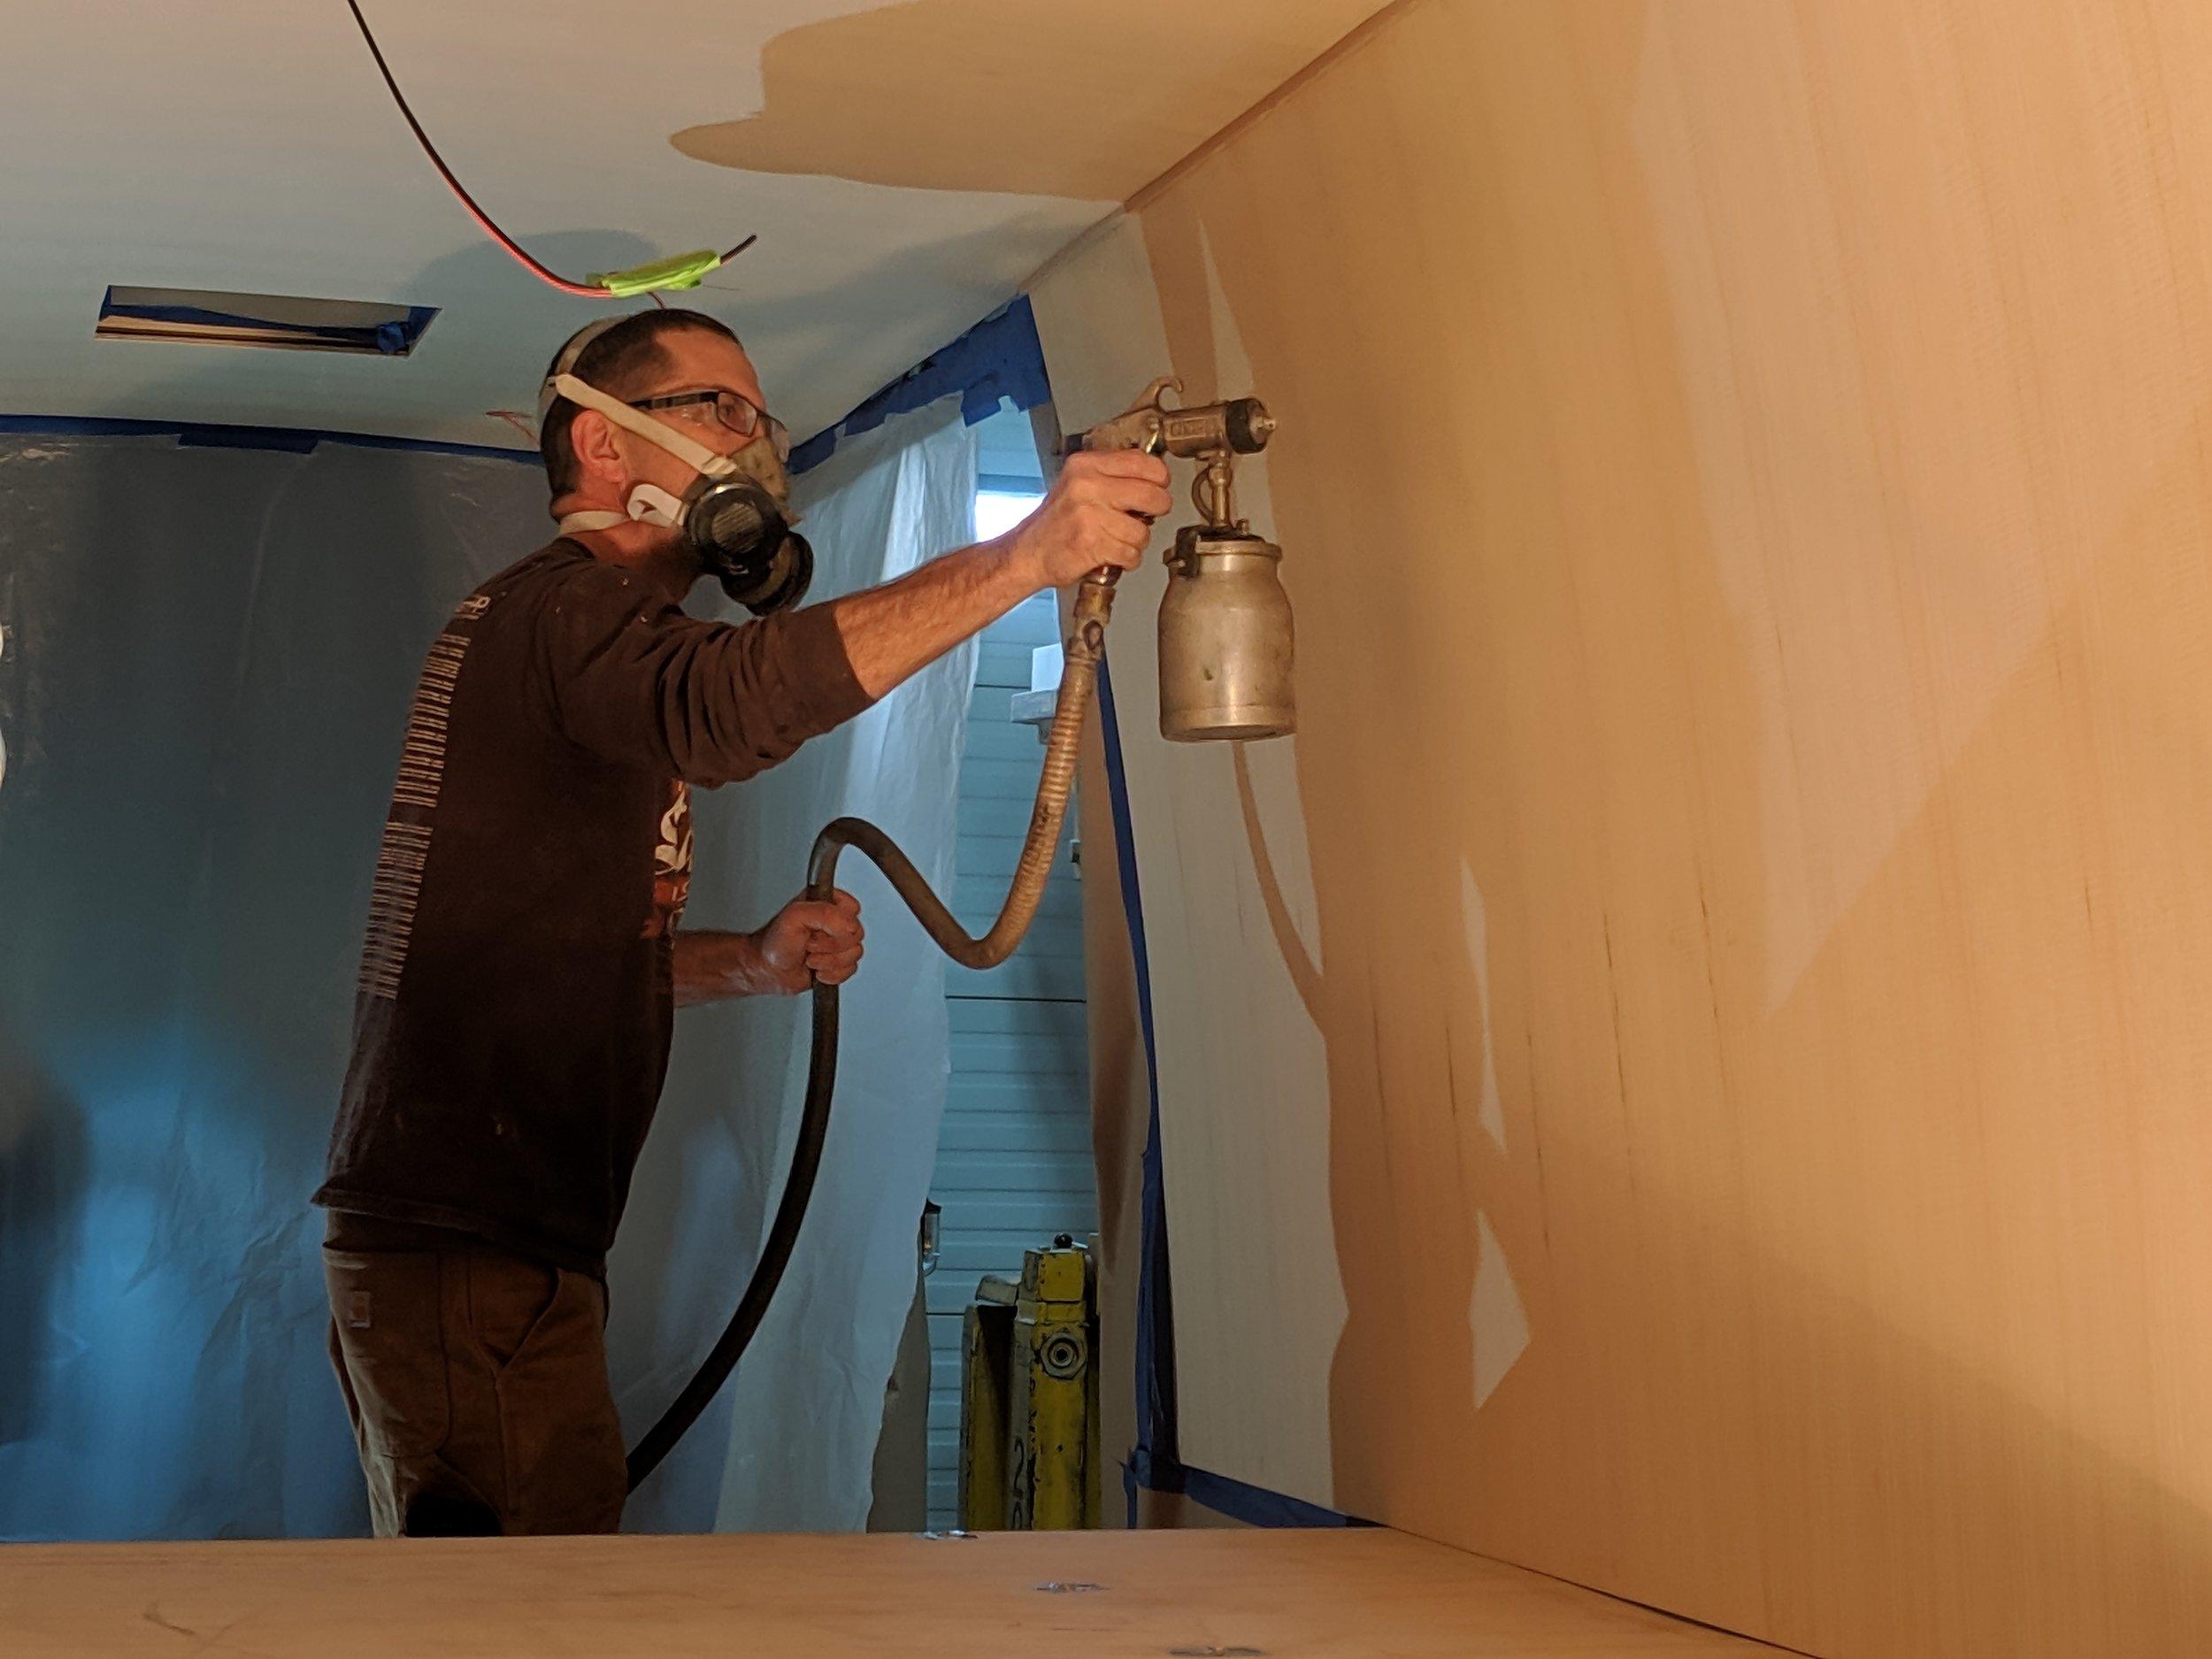 Spraying the walls